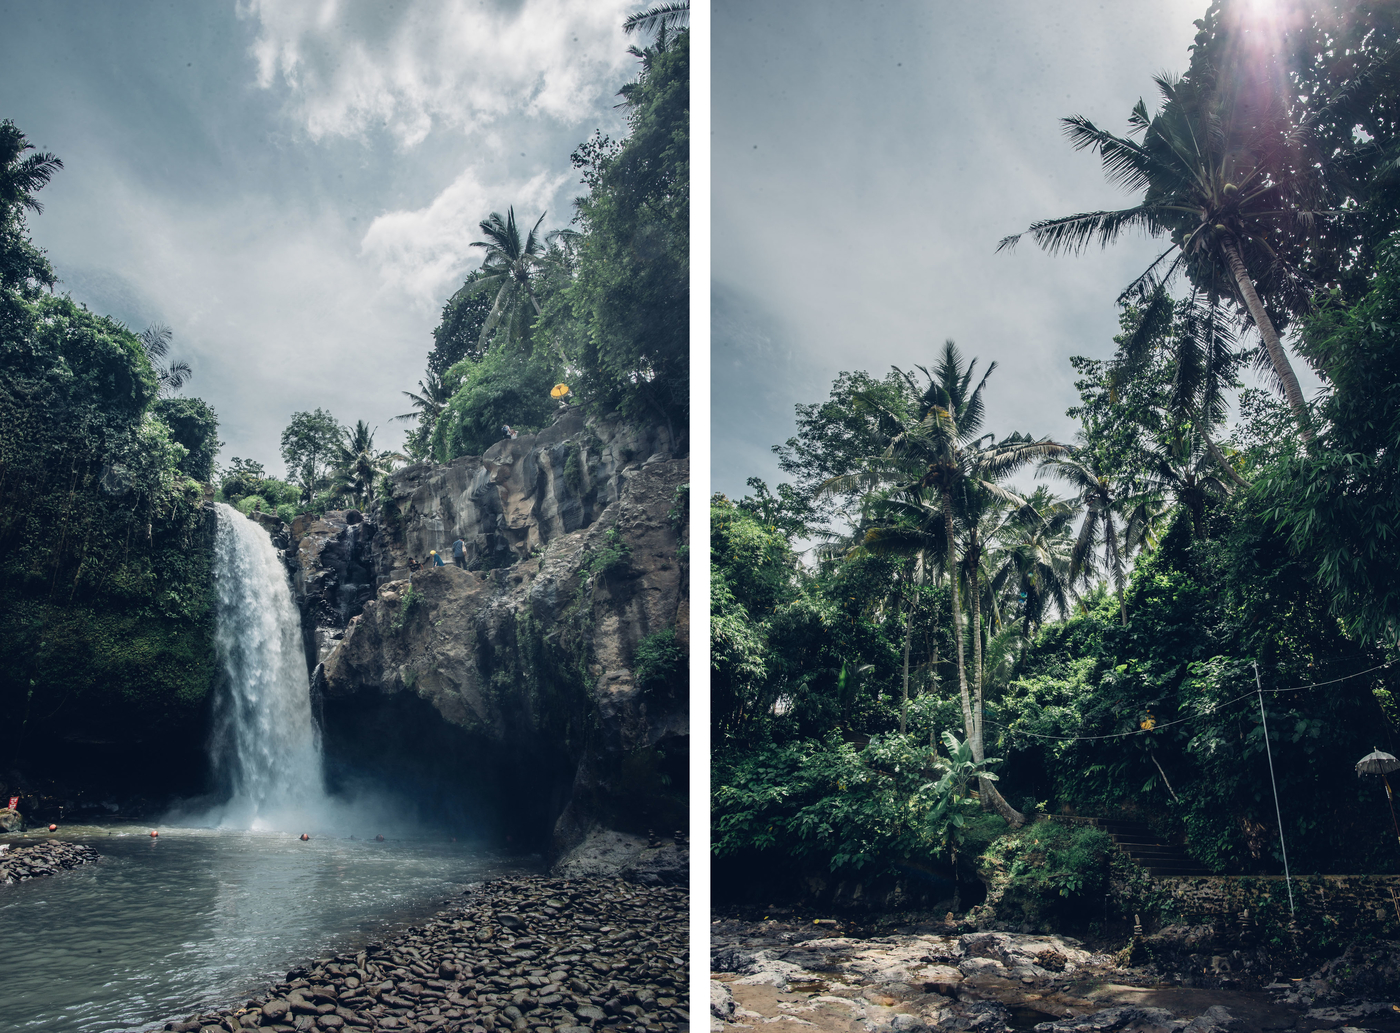 tegenunganwaterfall3.jpg